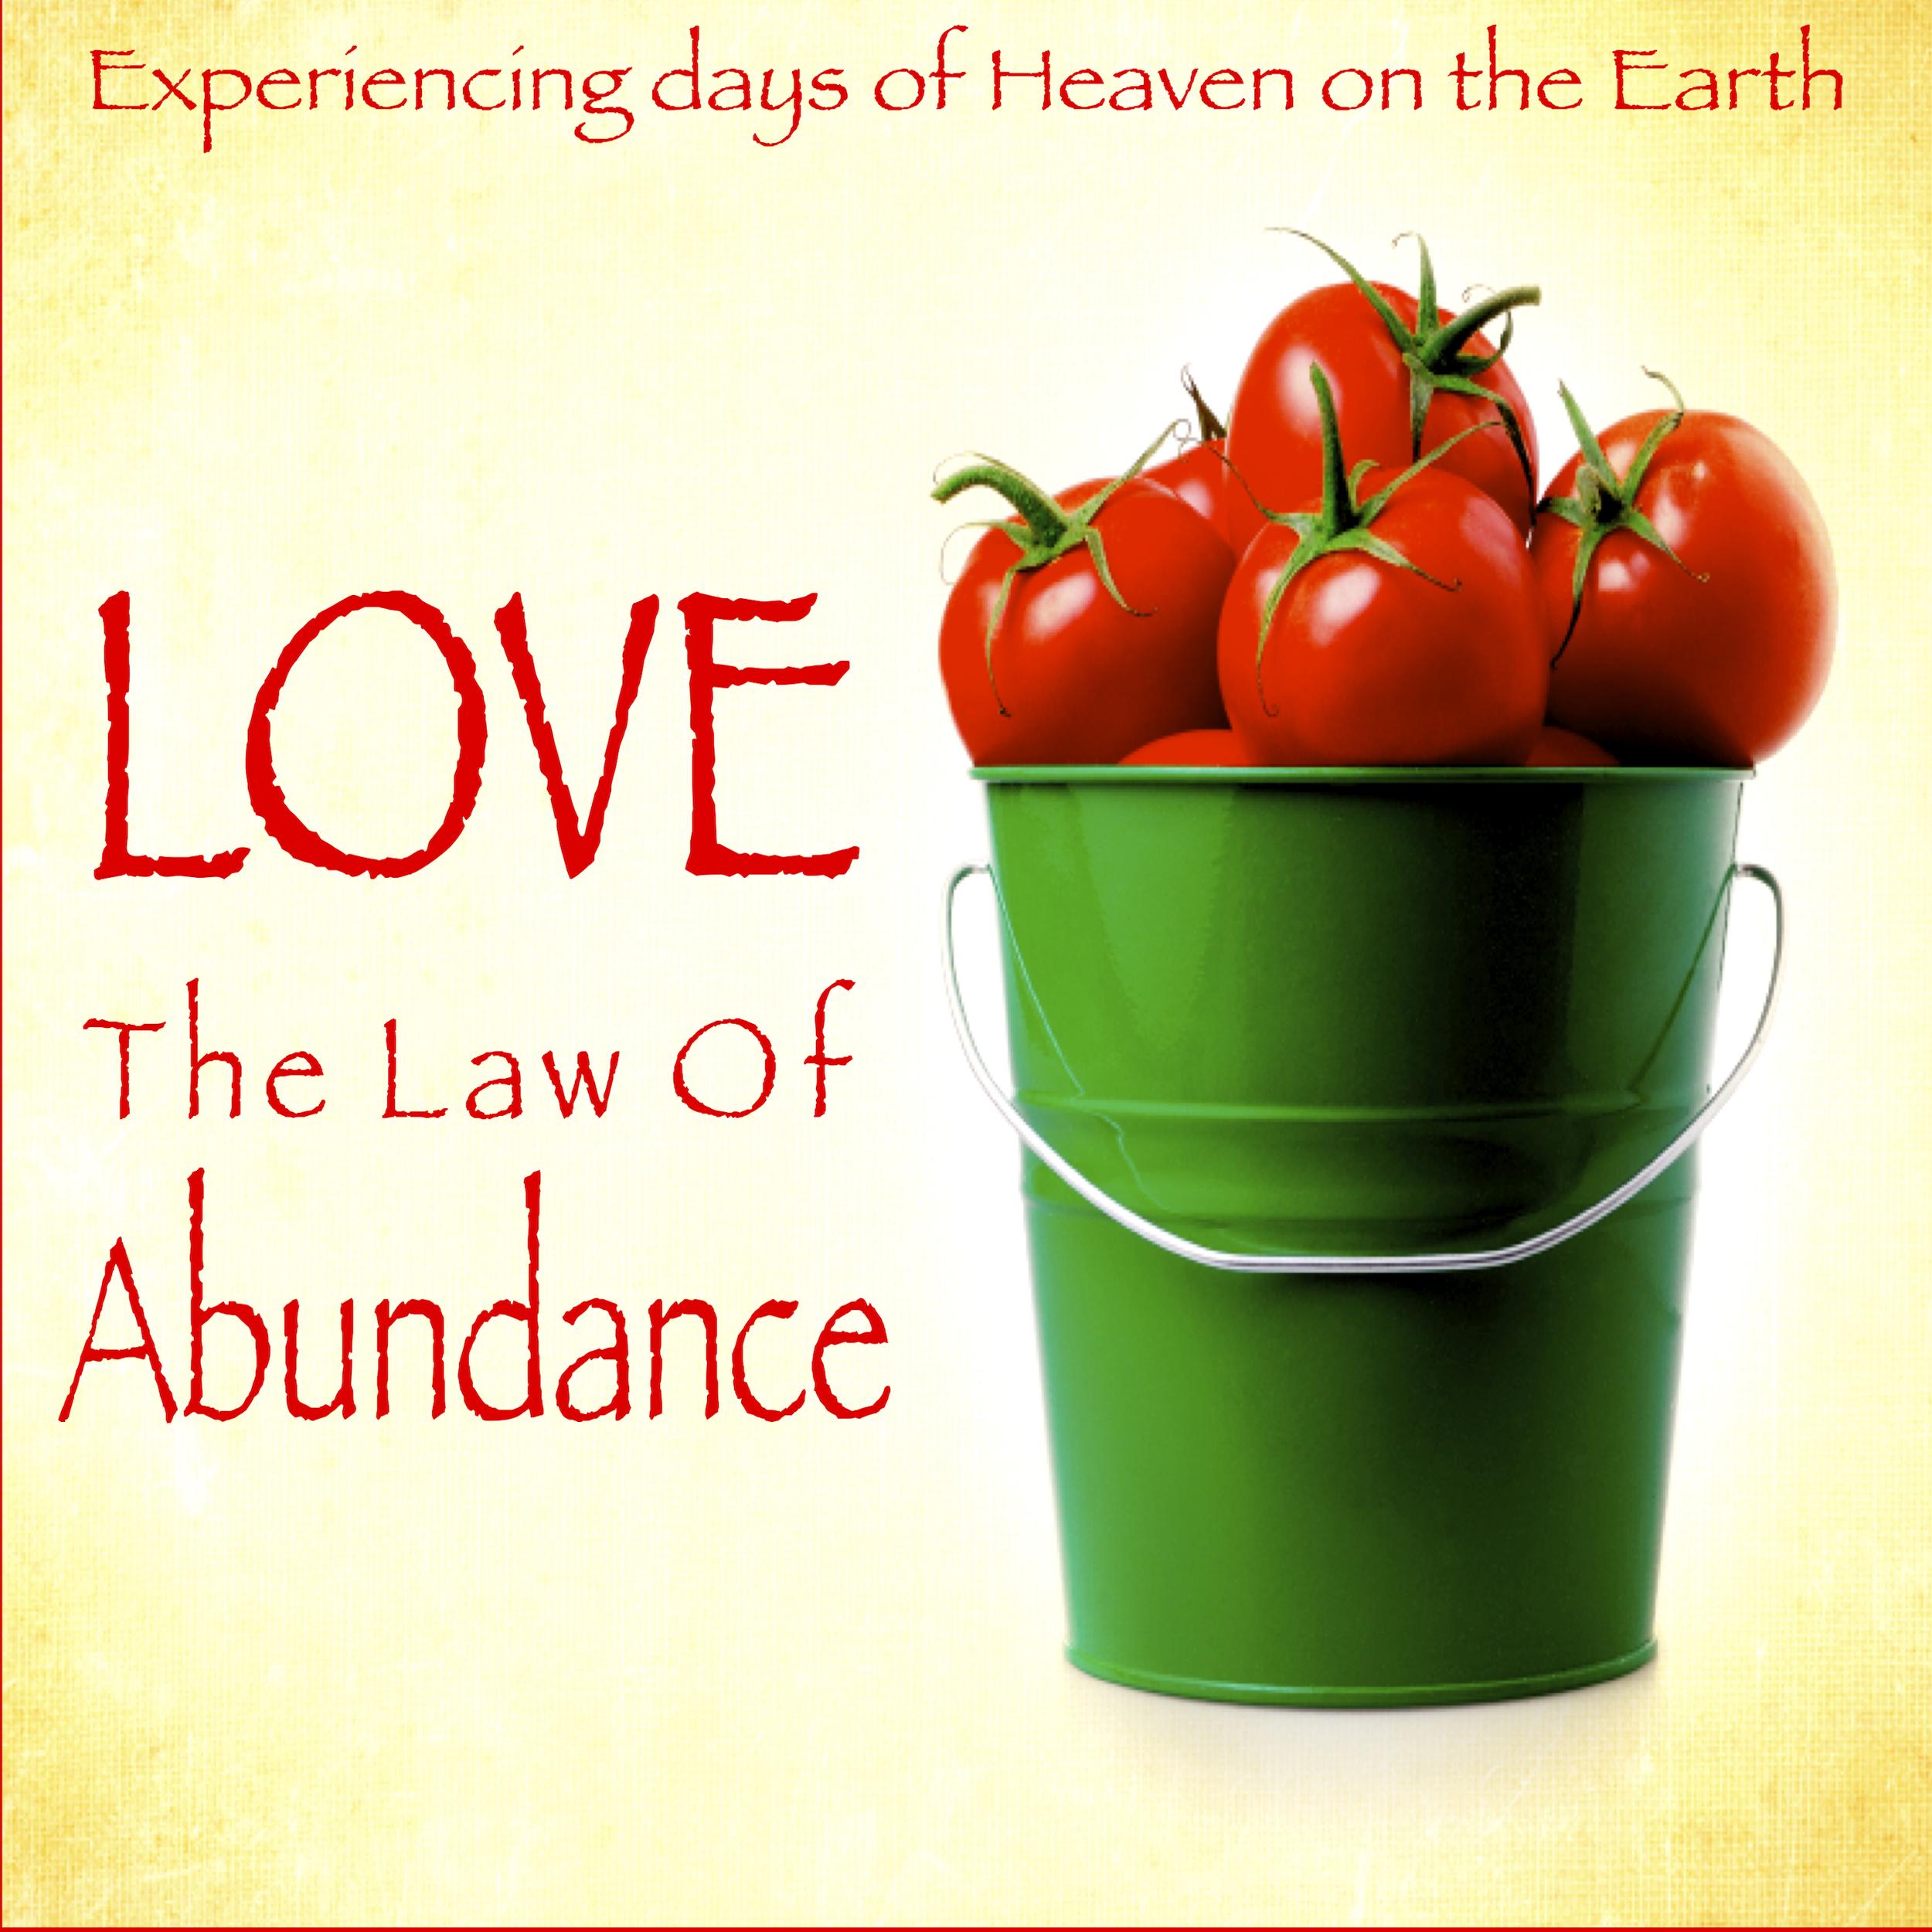 Love The Law Of Abundance.jpg